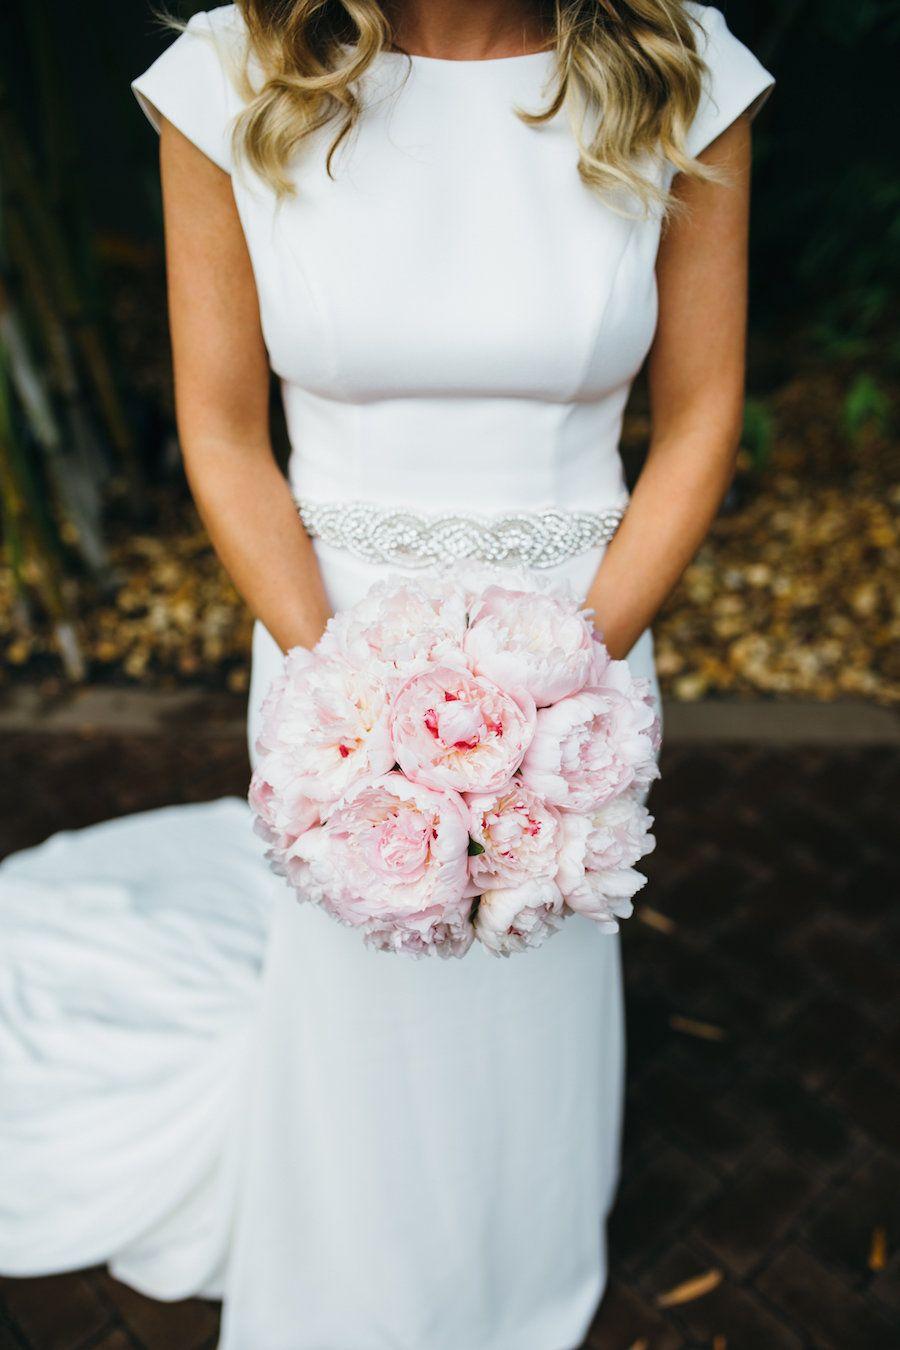 Bridal Wedding Portrait in Ivory, Cap Sleeve Sheath Mikaella Wedding Dress with Rhinestone Belt and Blush Pink Peony Wedding Bouquet